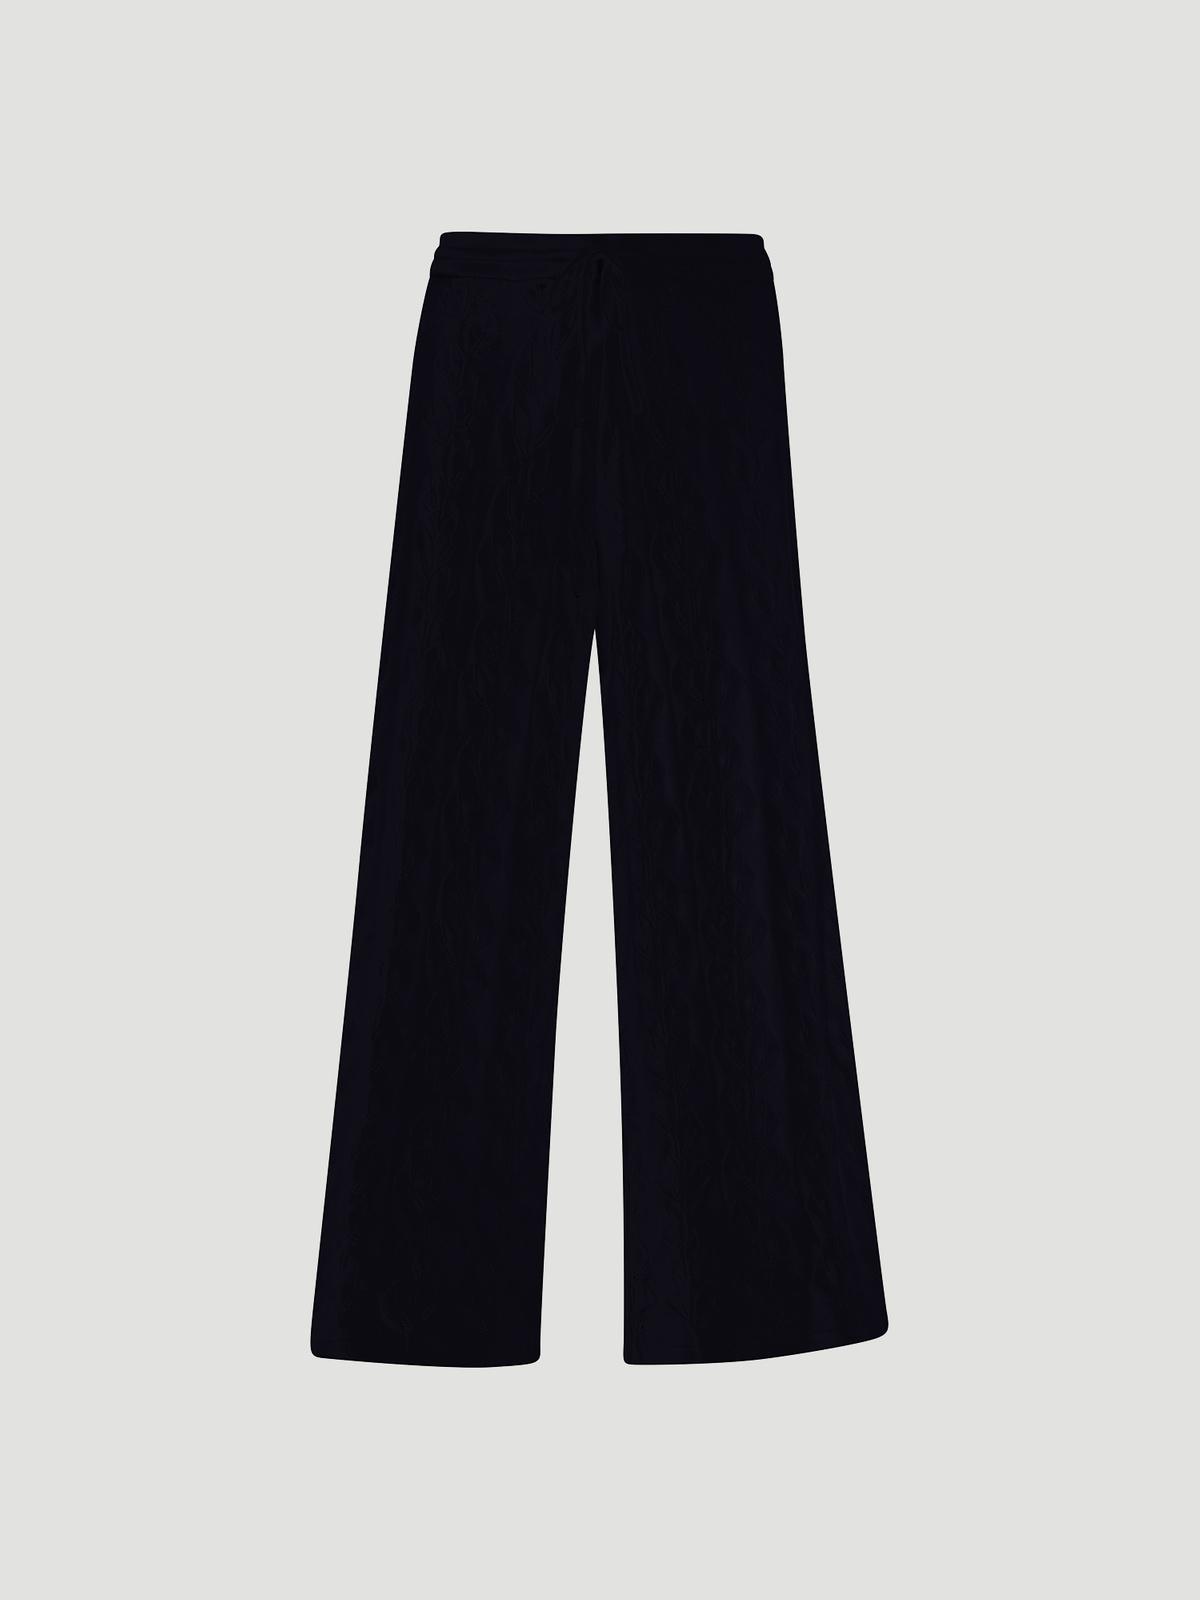 Thiril Knit Trouser Black 5